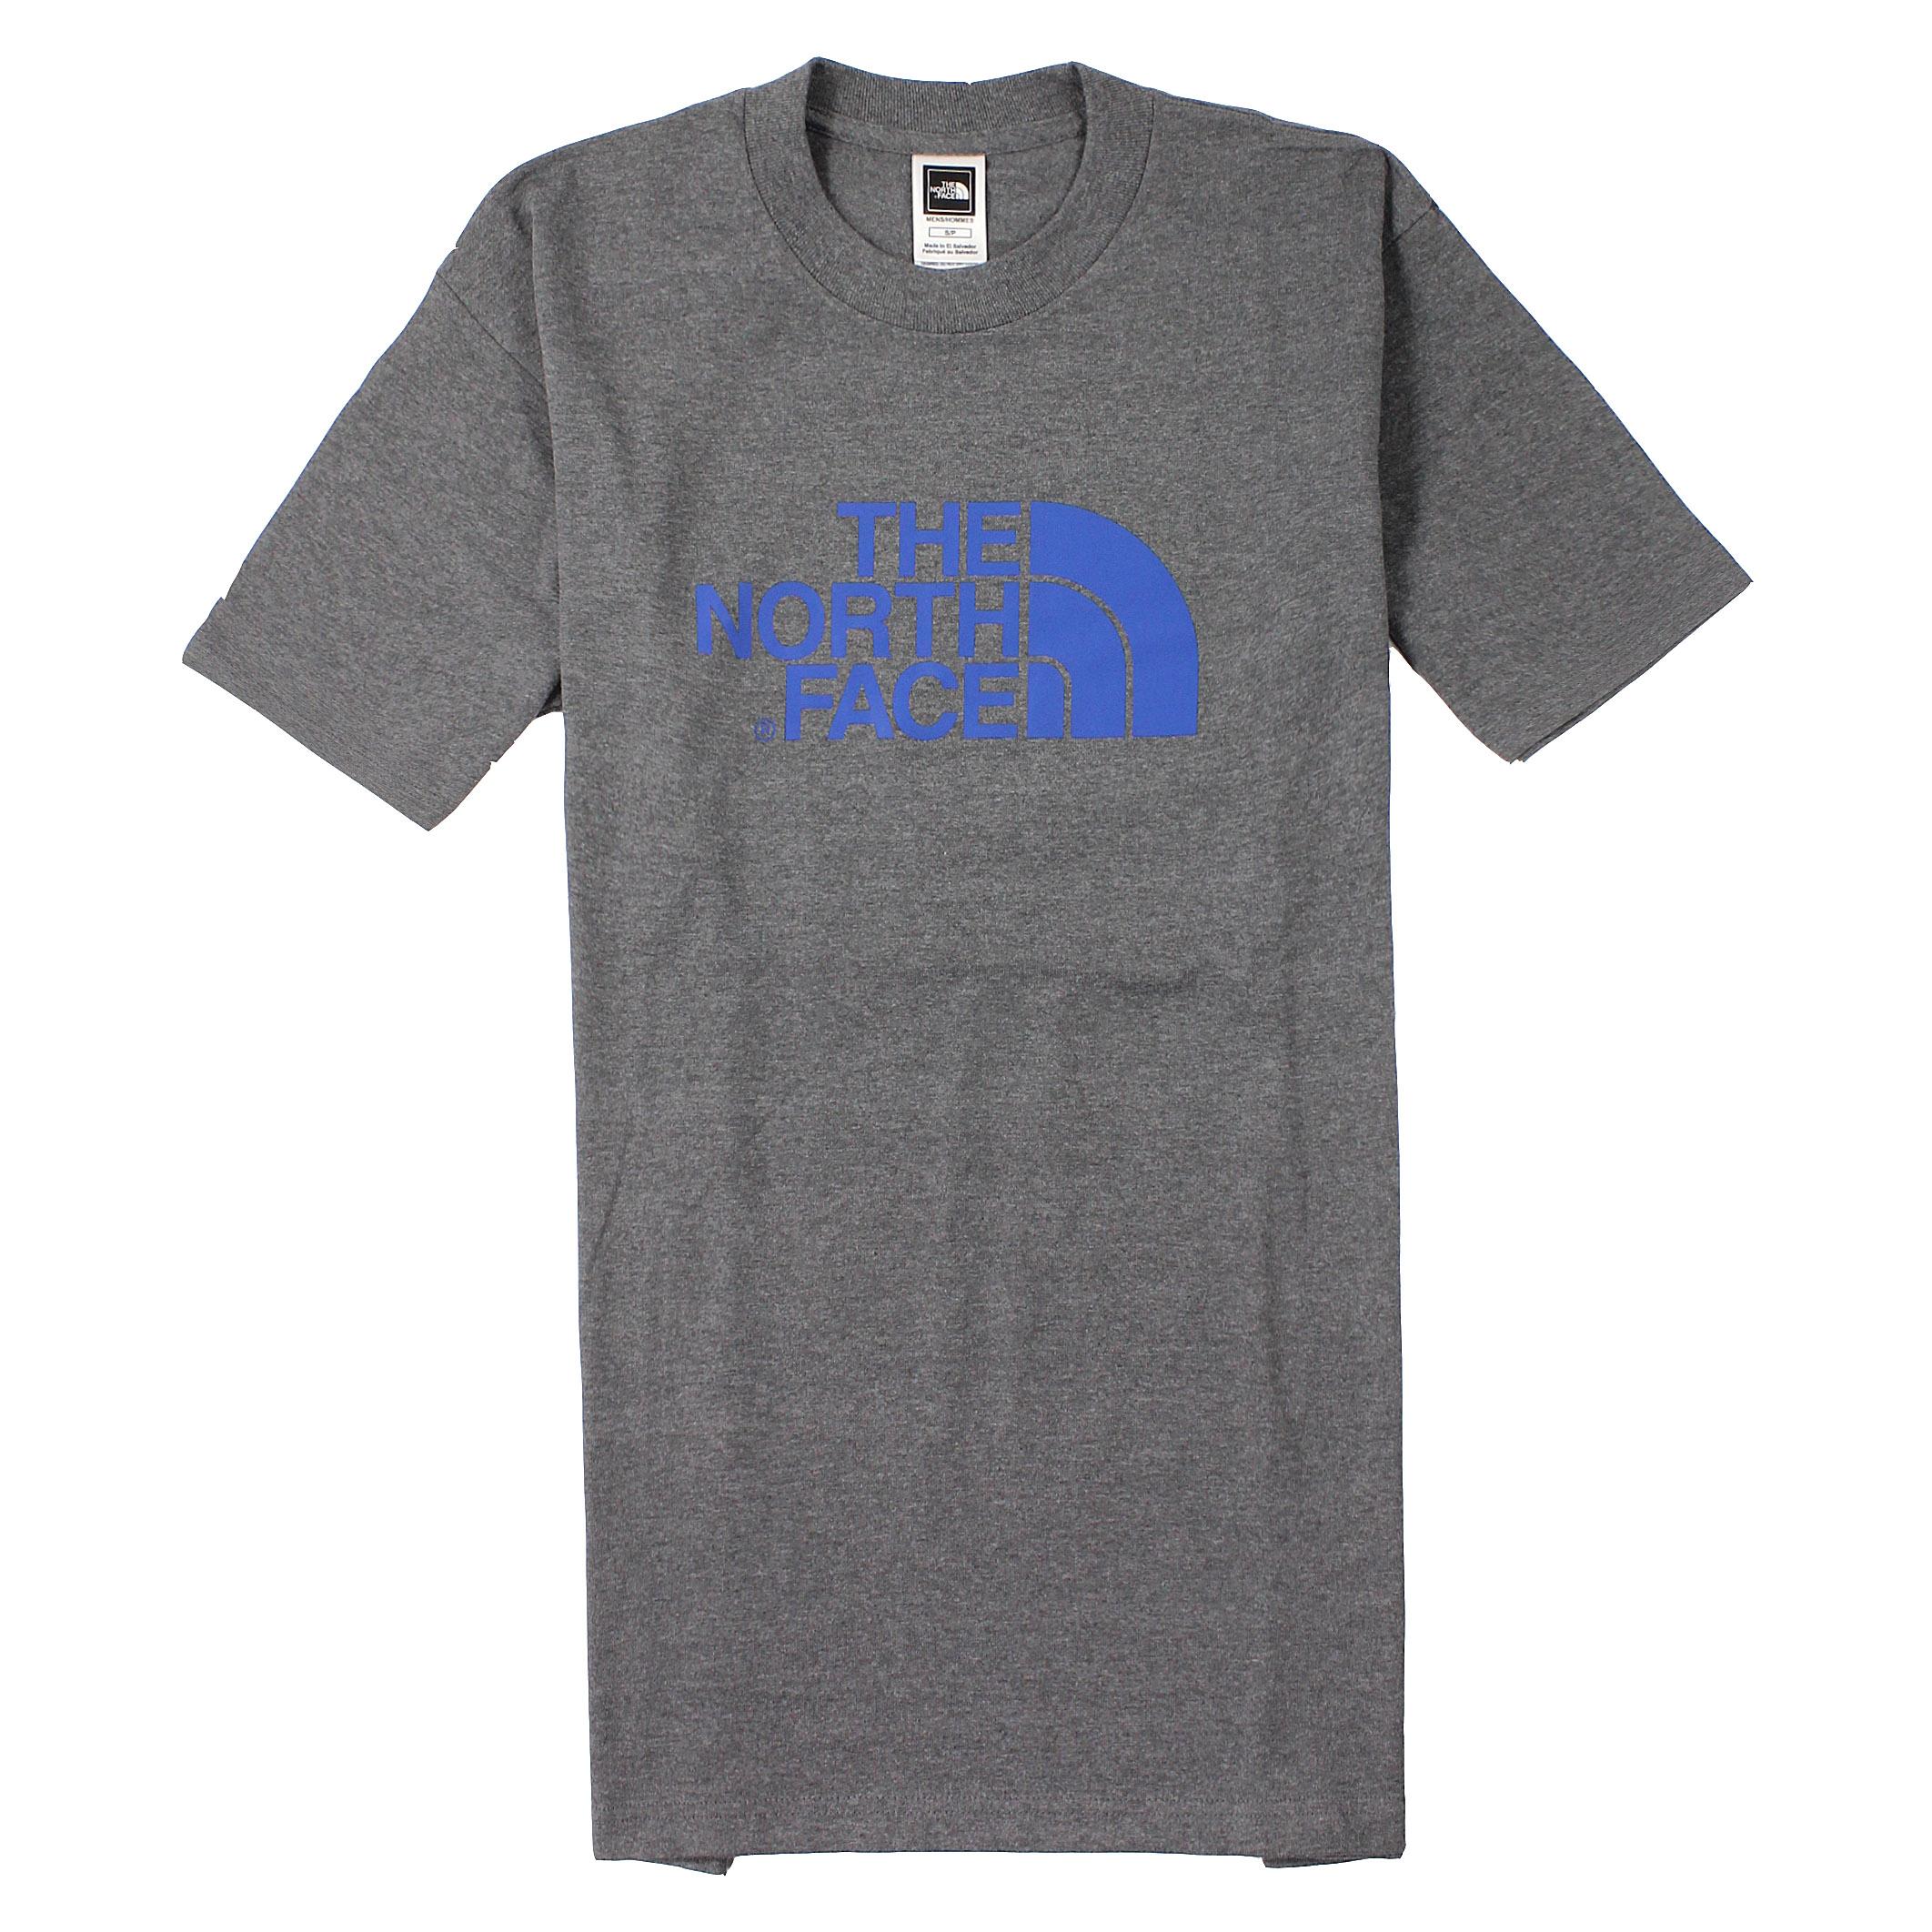 美國百分百【全新真品】The North Face T恤 短袖 上衣 T-shirt 北臉 深灰 素面 純棉 Logo 男 S L號